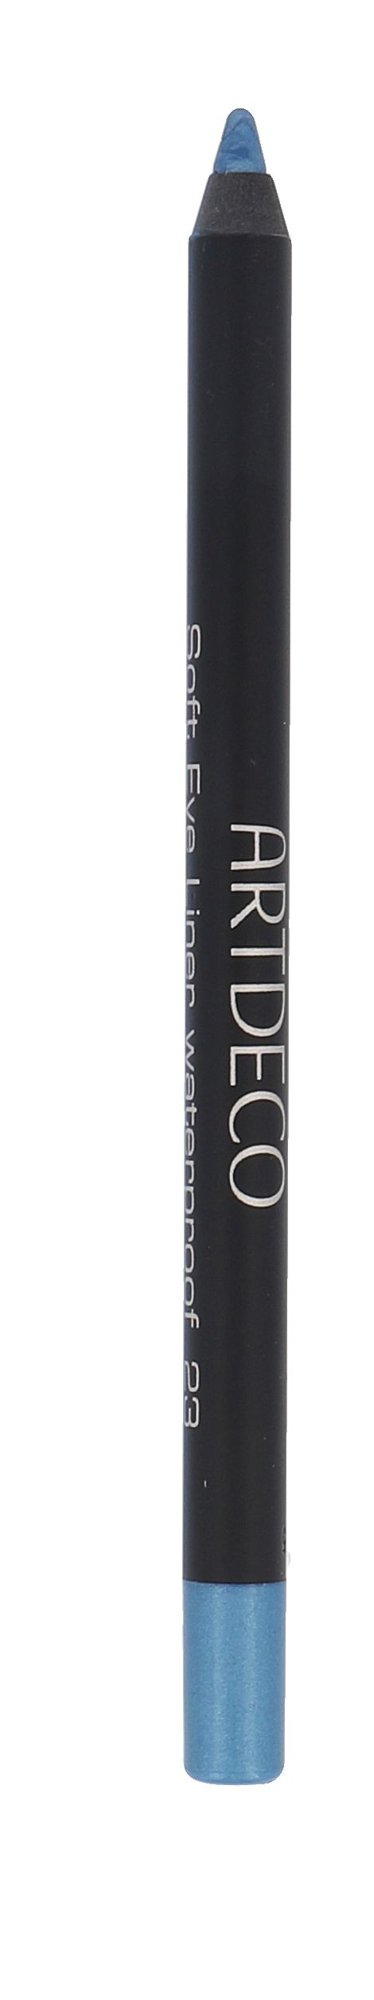 Artdeco Soft Eye Liner Cosmetic 1,2ml 23 Cobalt Blue